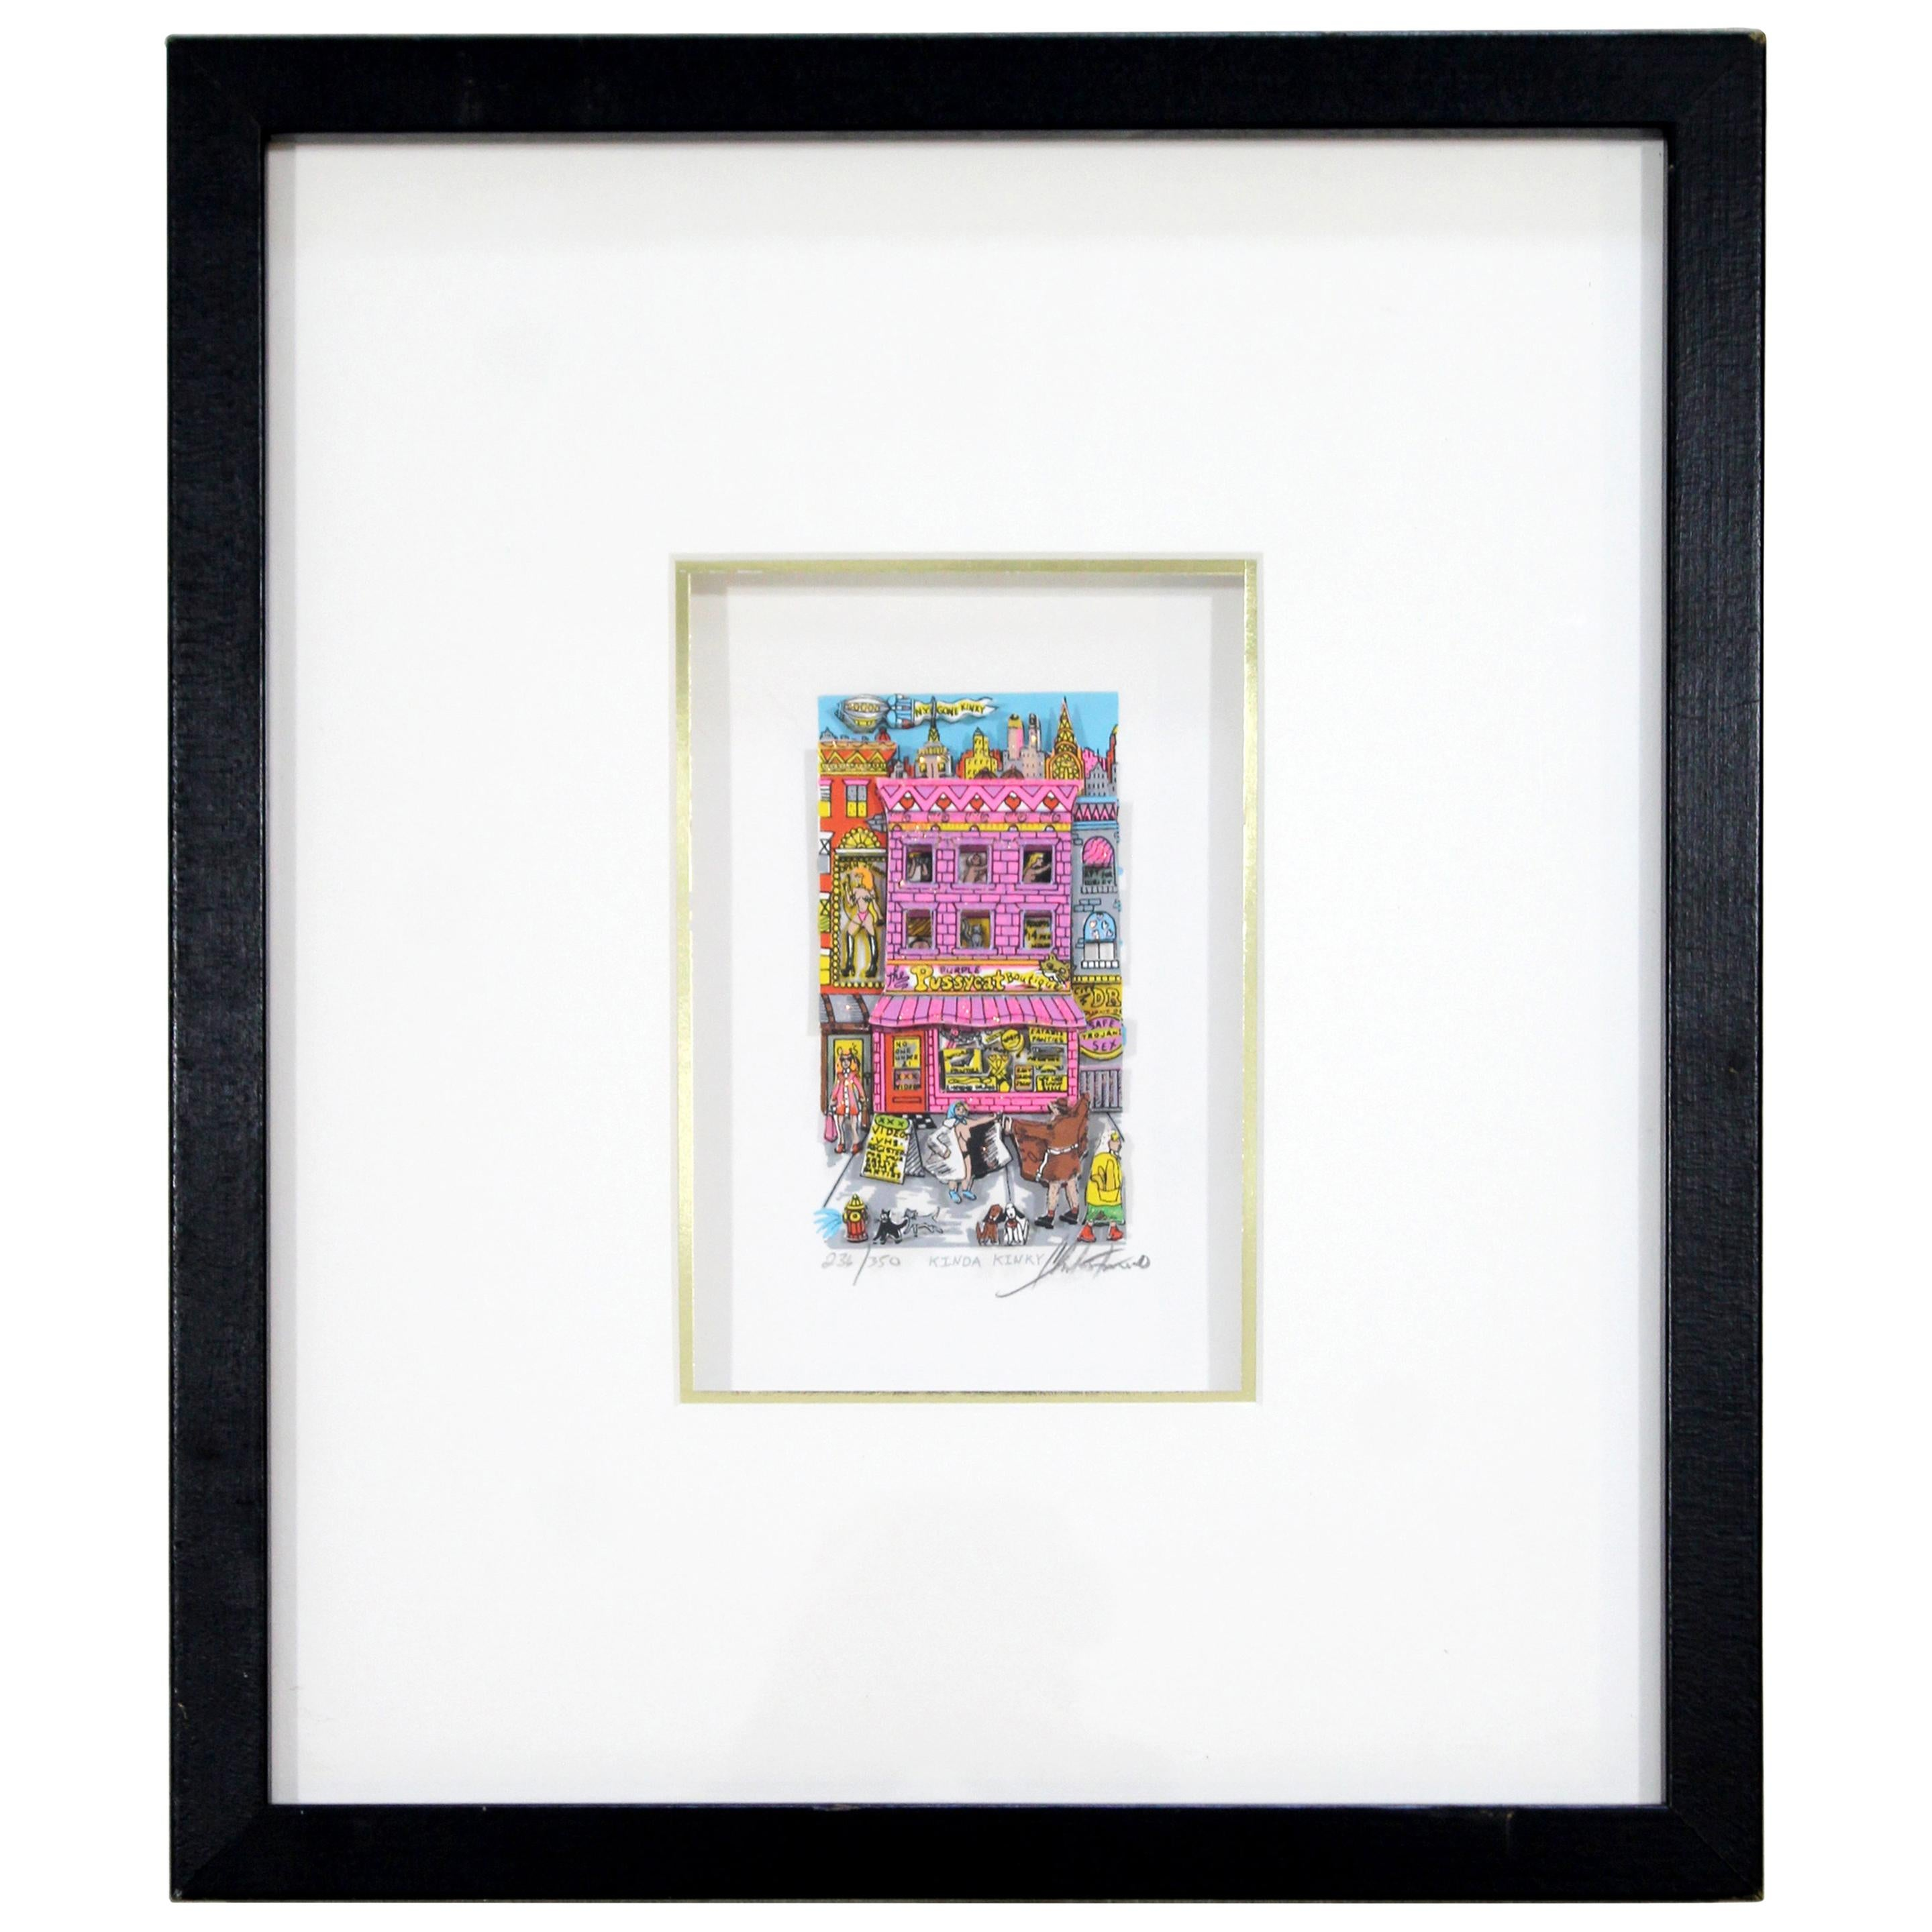 Contemporary Modern Framed Kinda Kinky 3D Serigraph Signed Fazzino 1996 236/350